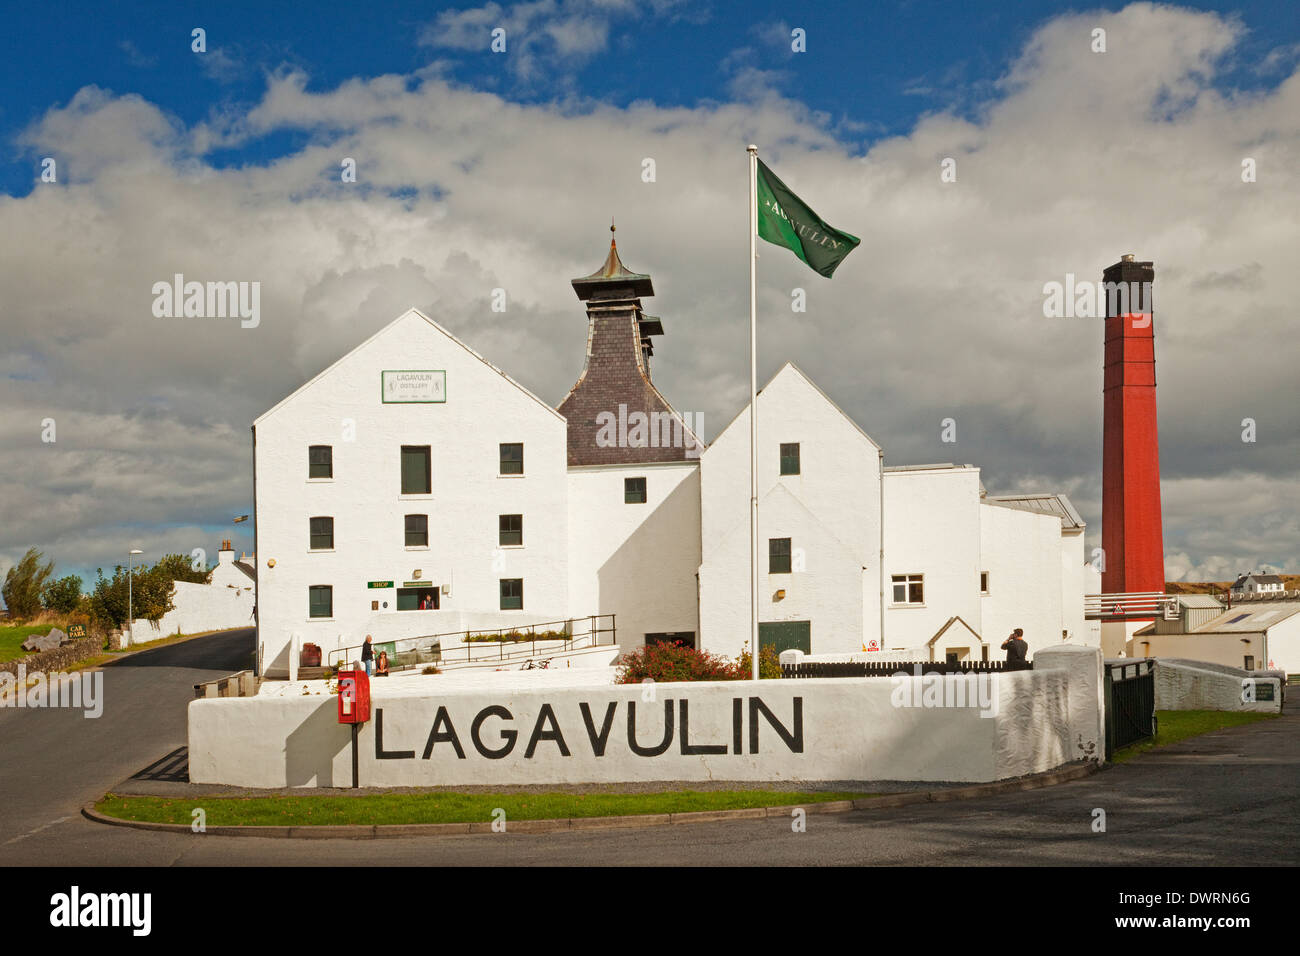 Lagavulin Distillery near Port Ellen on the Isle of Islay - Stock Image